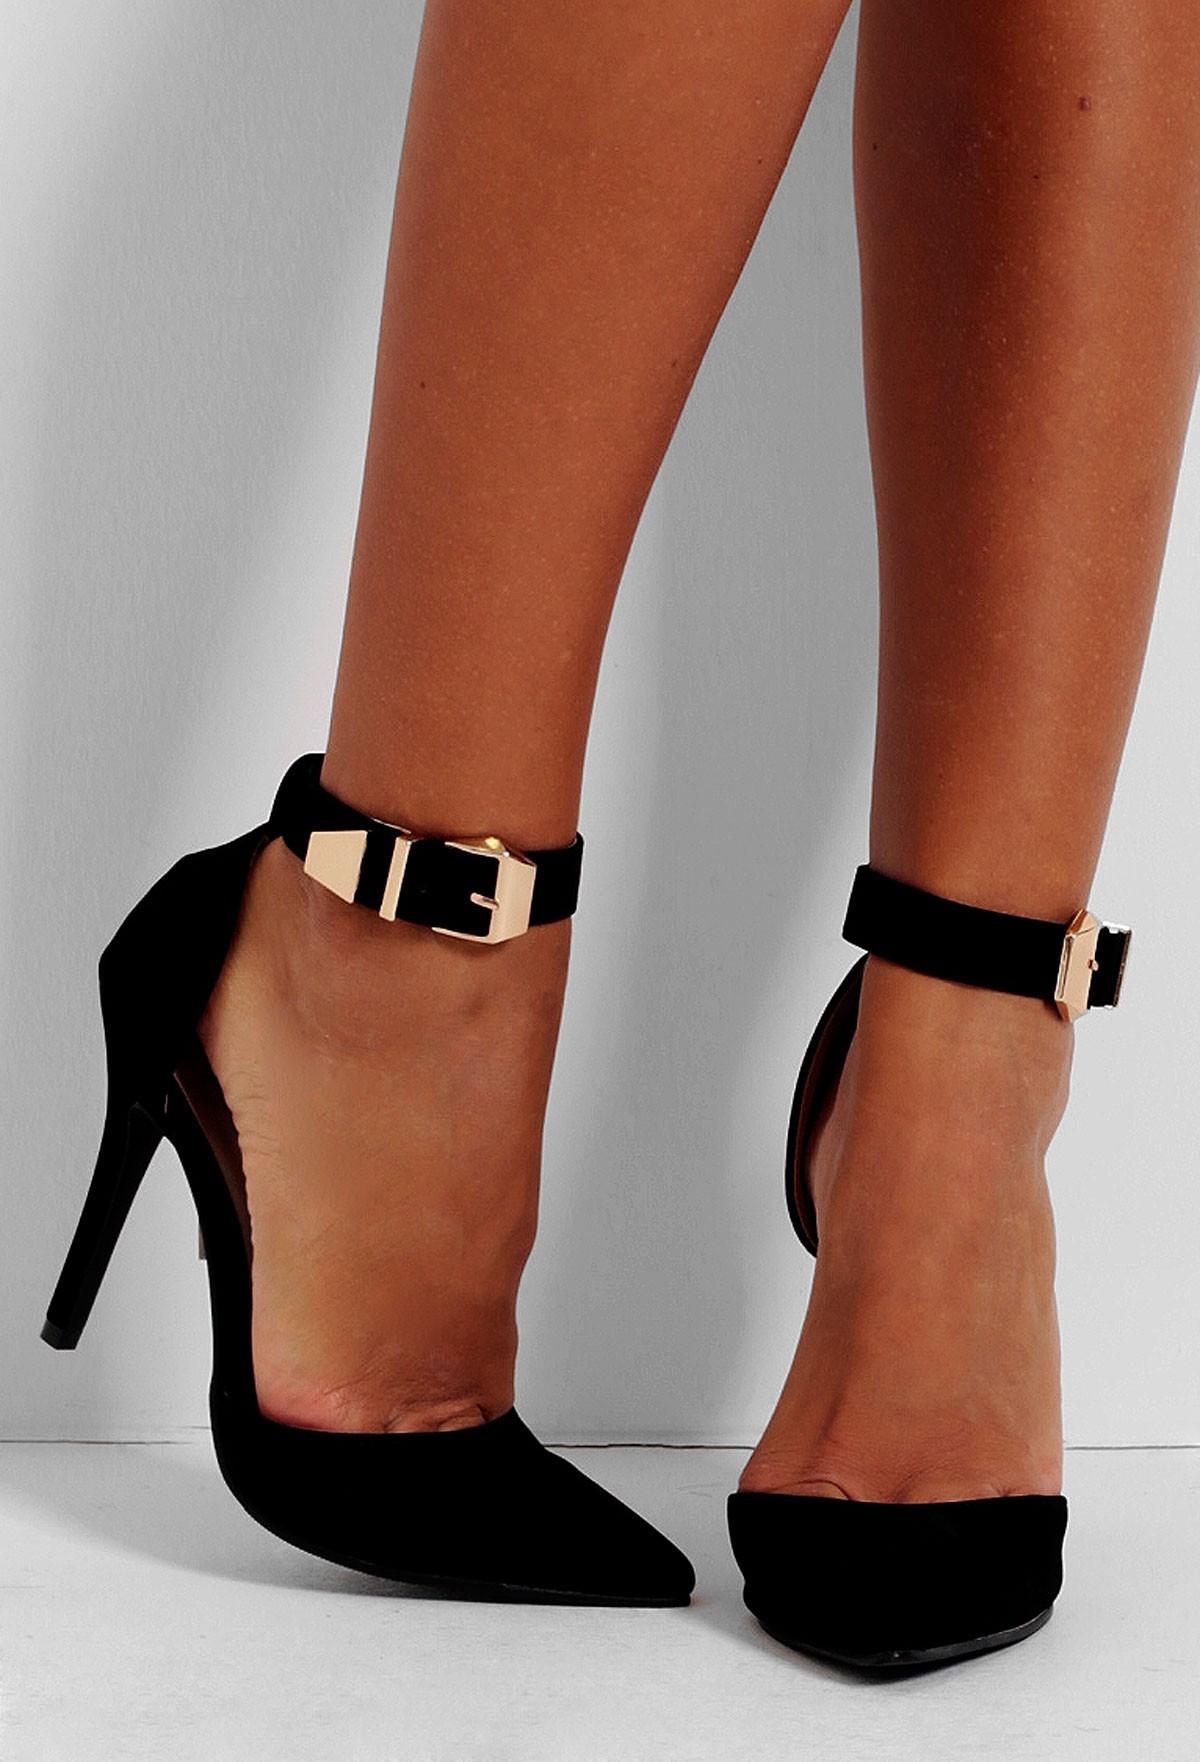 Frankel Black Gold Buckle Suedette Shoes | Pink Boutique